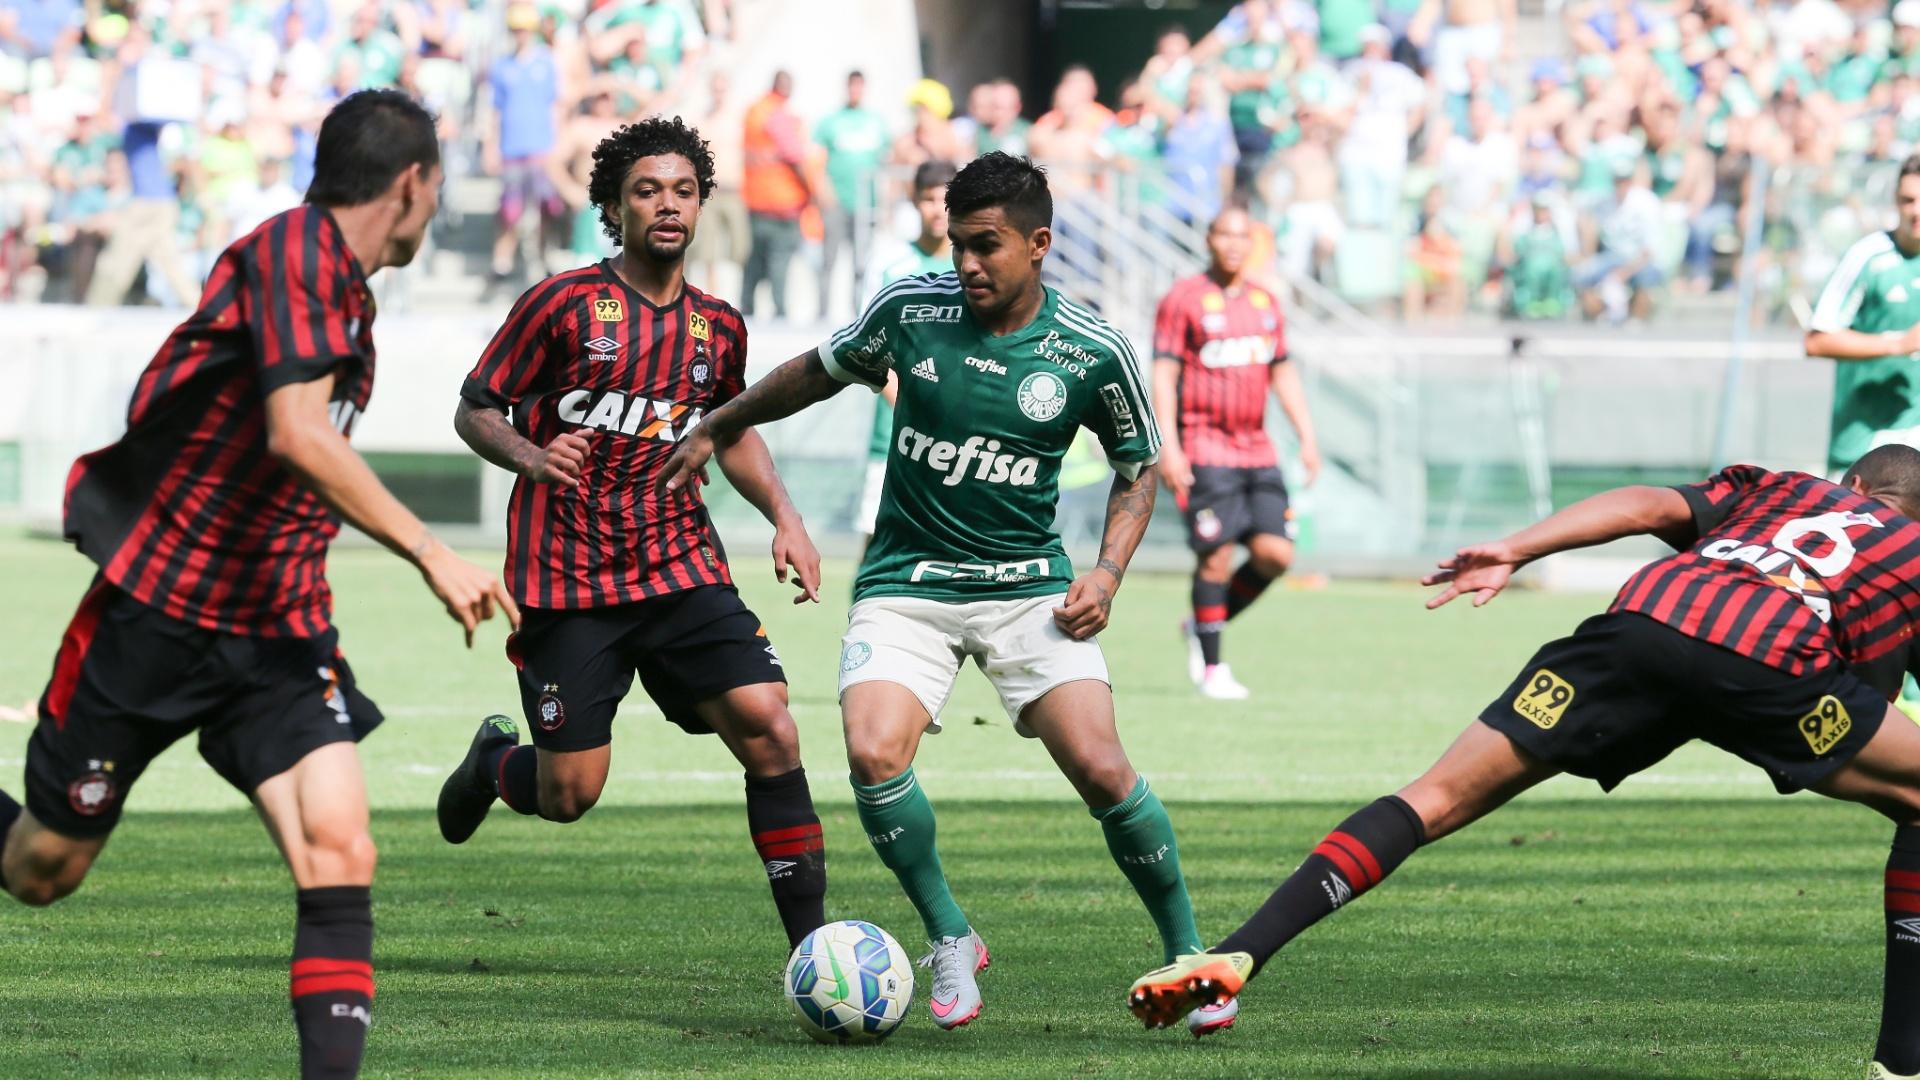 Lance da partida entre Palmeiras e Atlético-PR, recorde de público do time alviverde no Campeonato Brasileiro